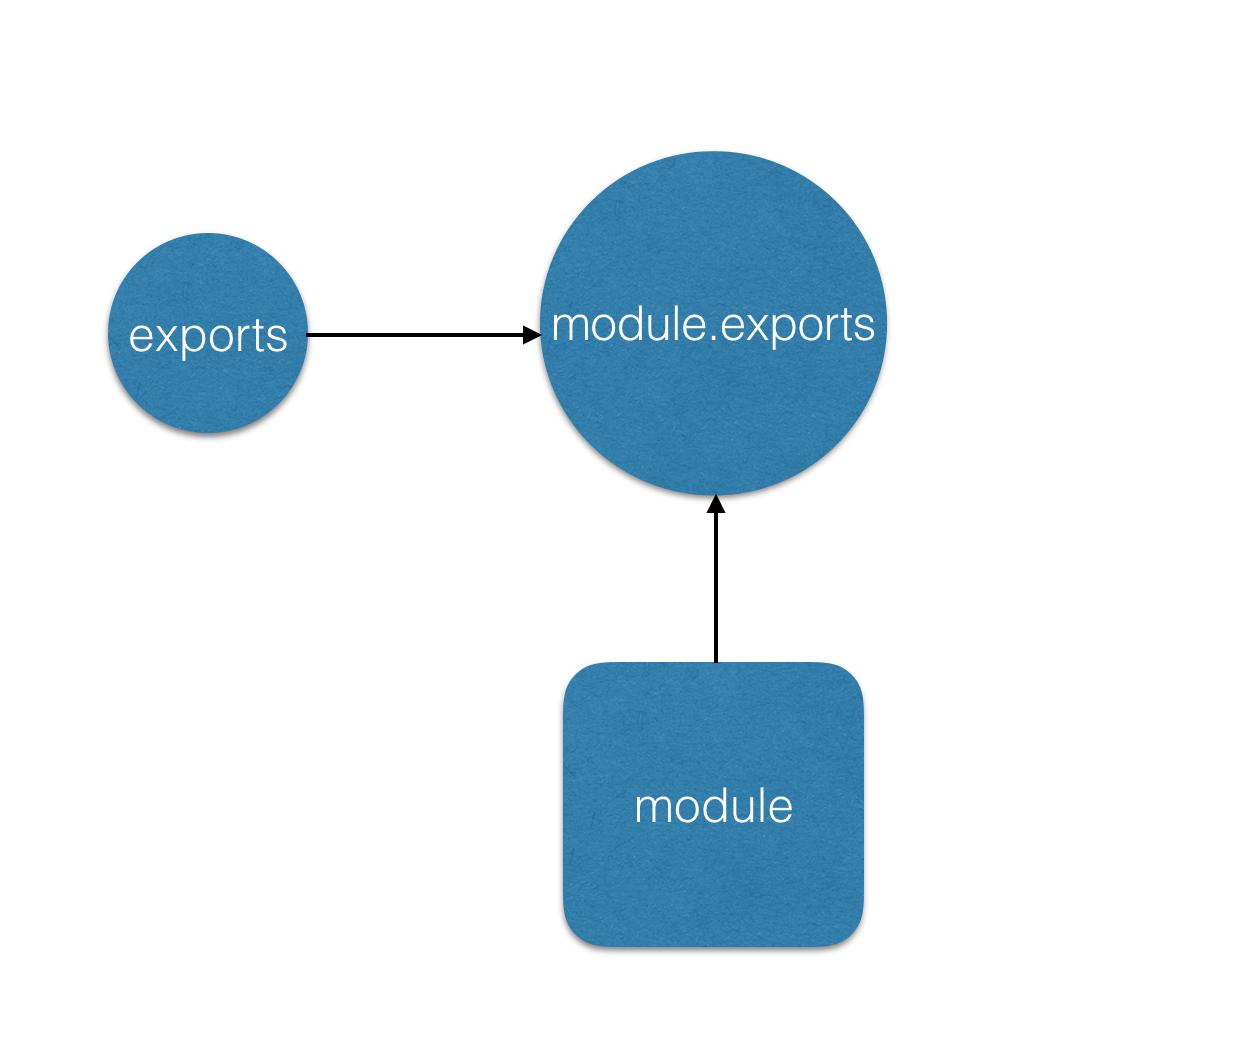 exports和module的引用图.png